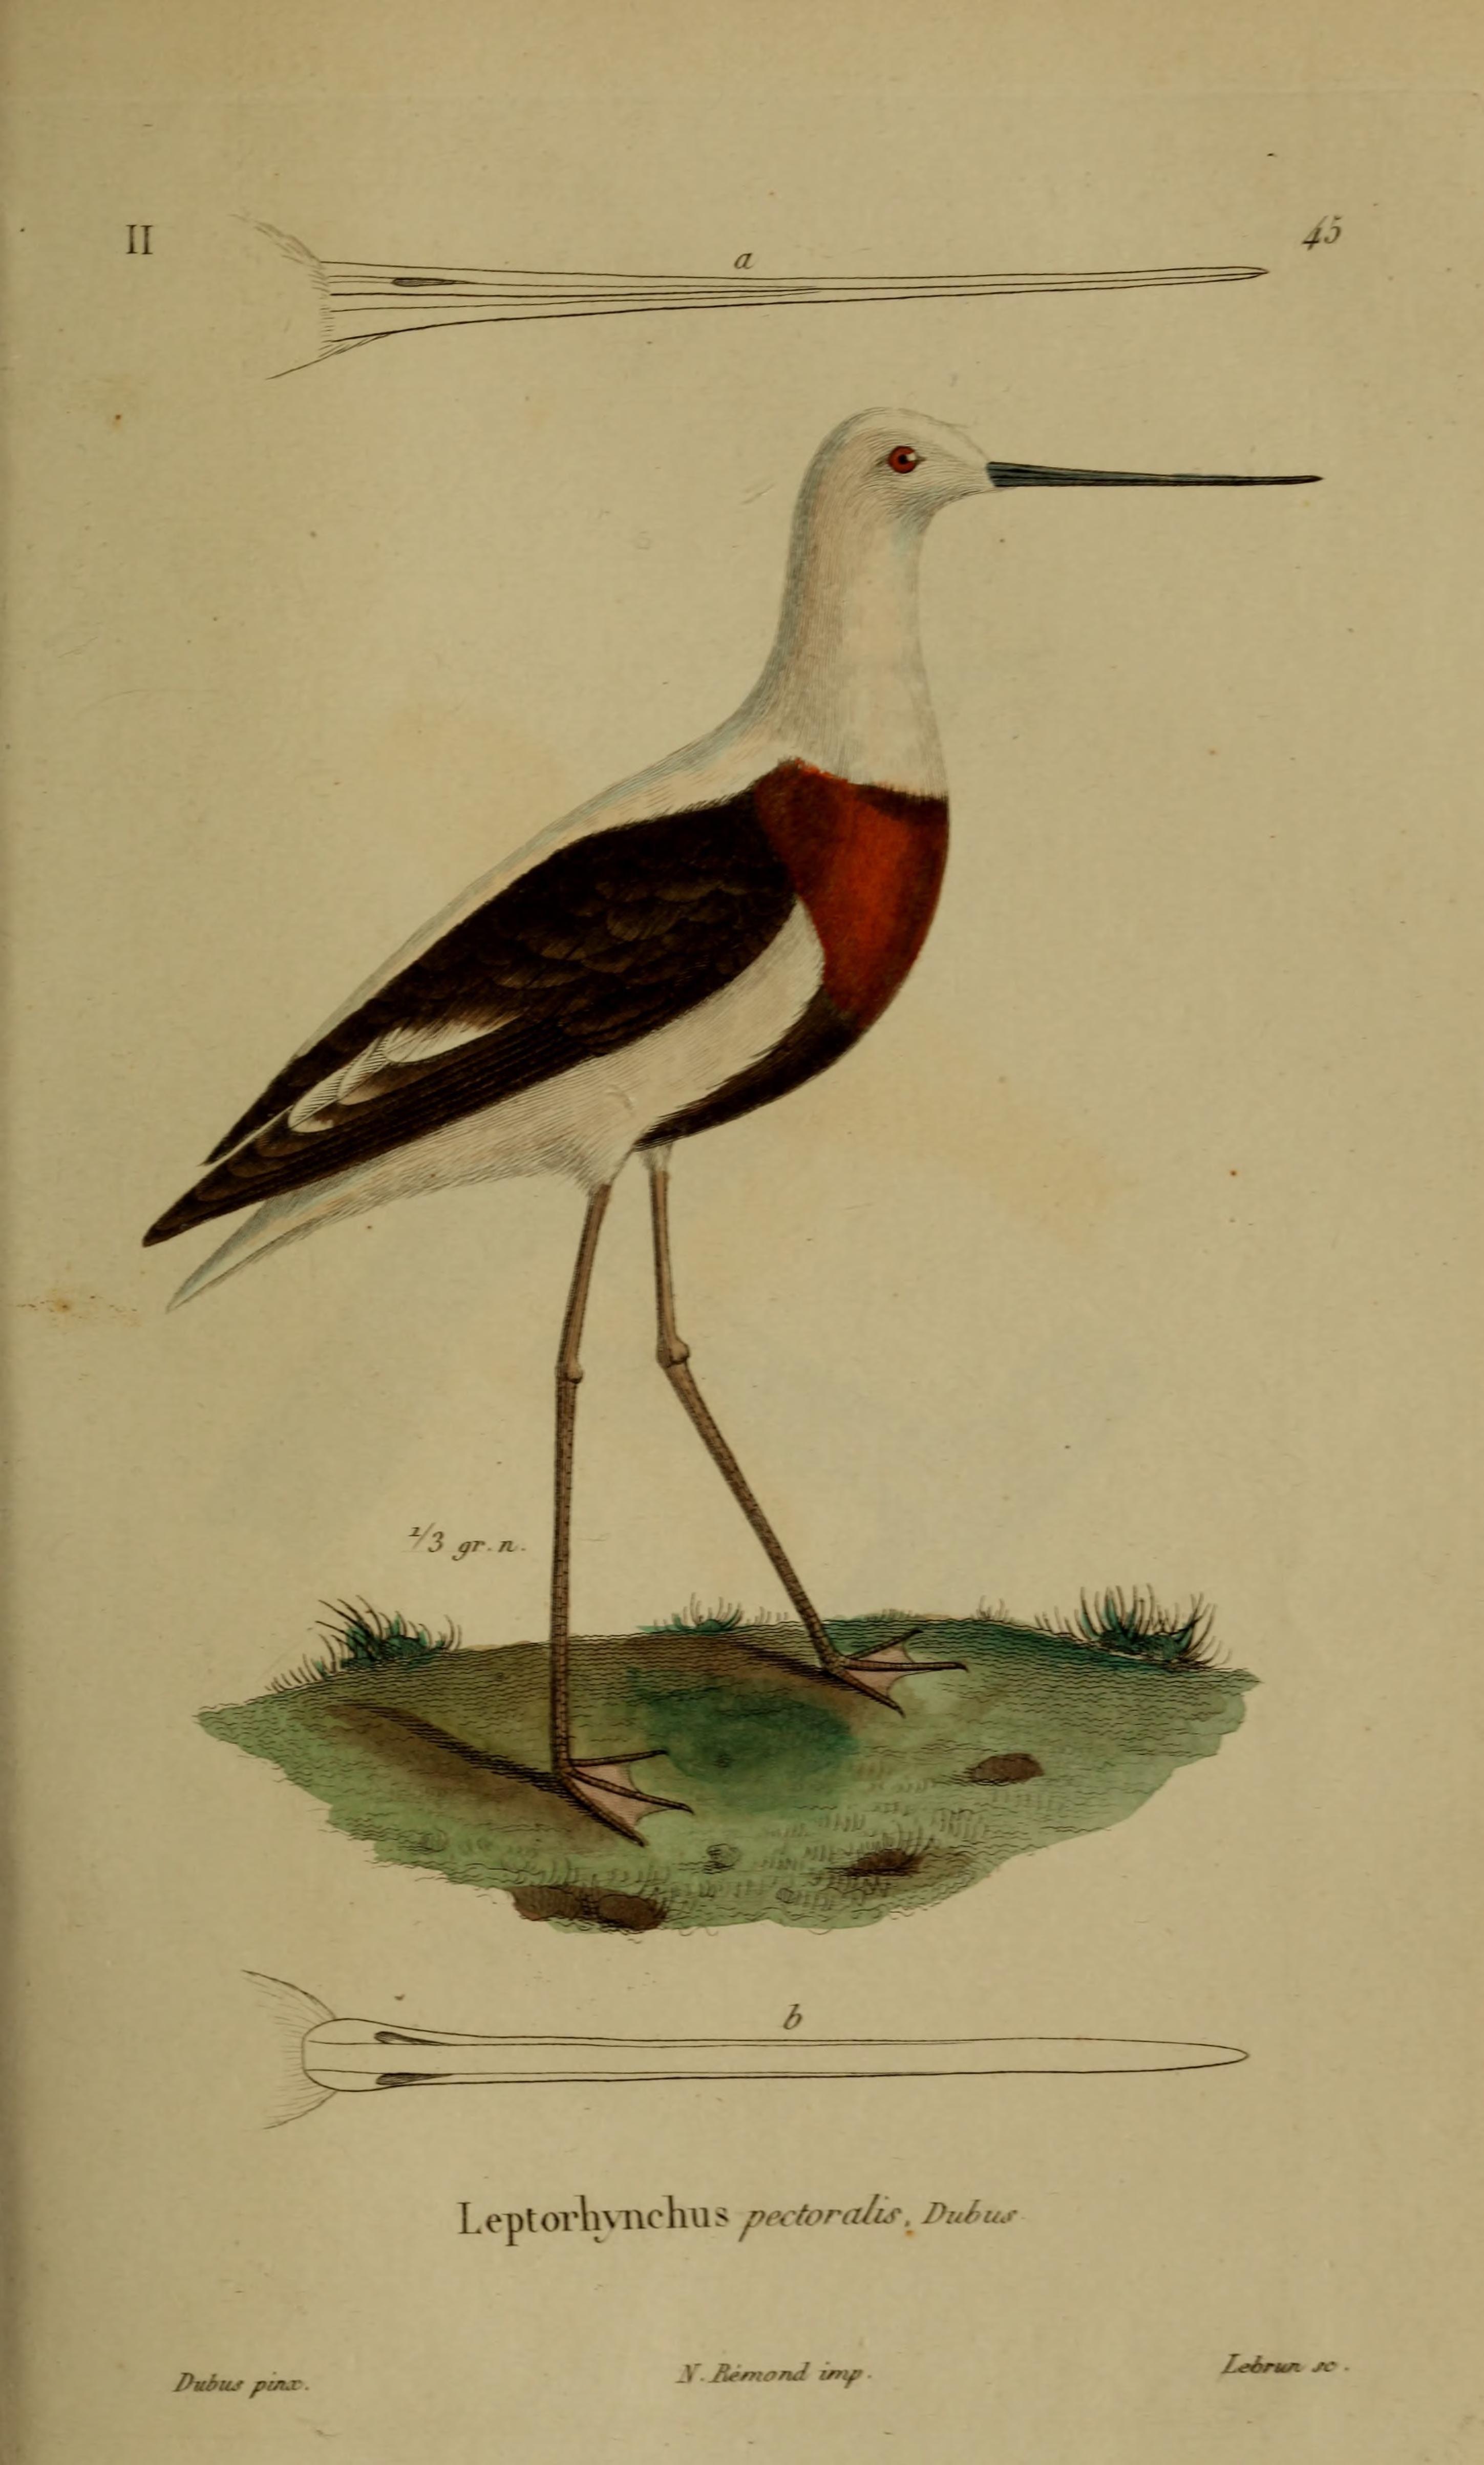 v.5 (1835) - Magasin de zoologie. - Biodiversity Heritage Library ...